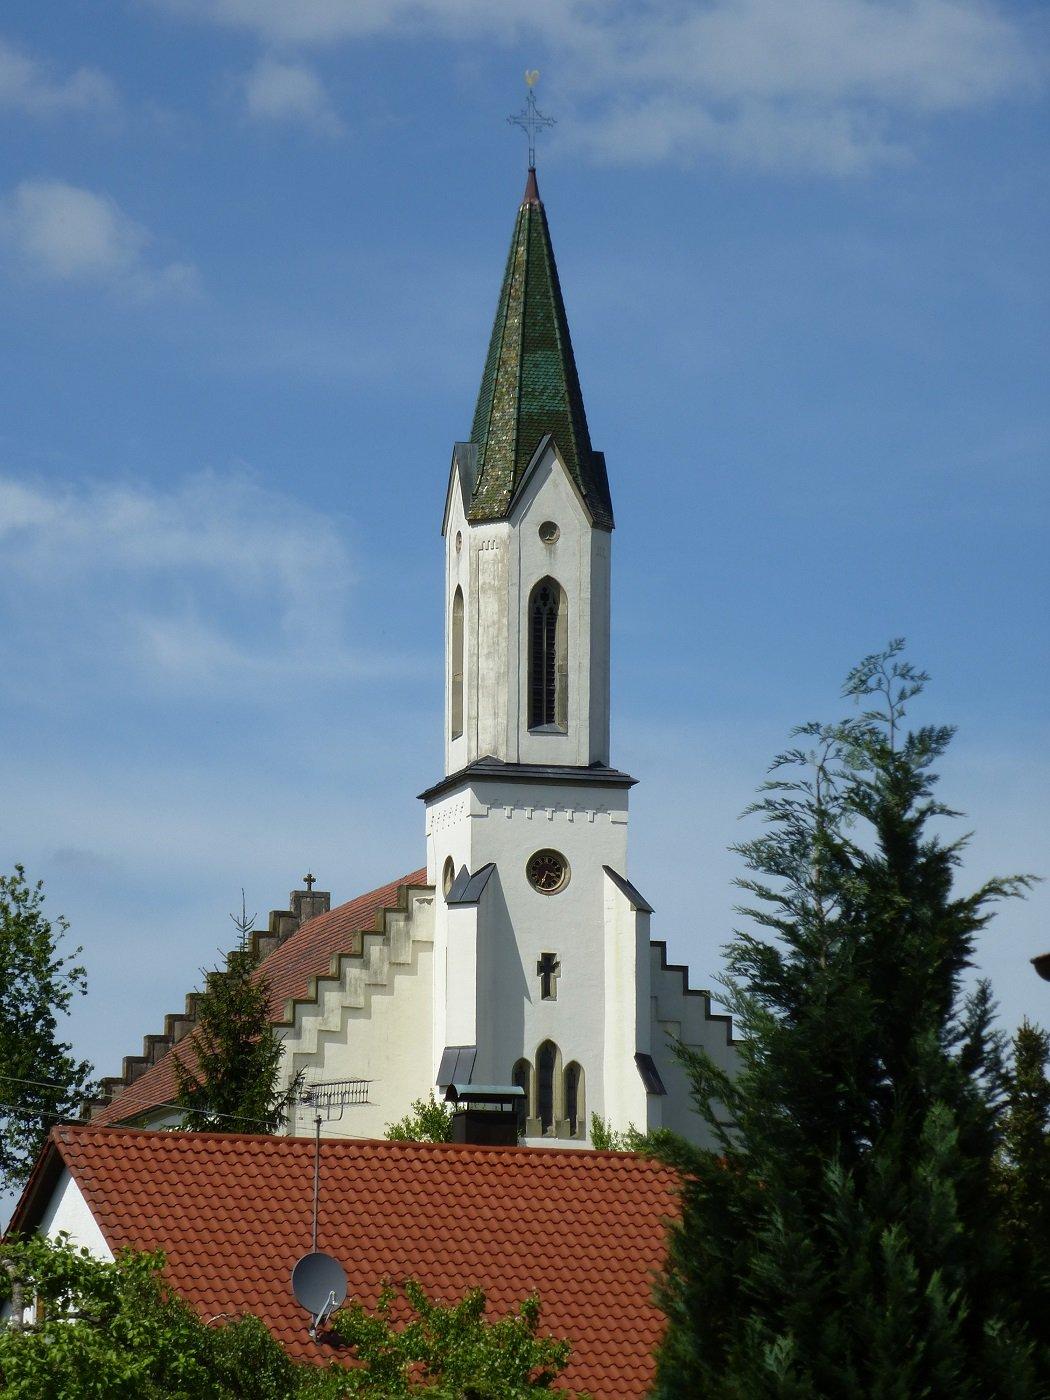 Kirchturm der St. Patriciuskirche Heiligenzimmern